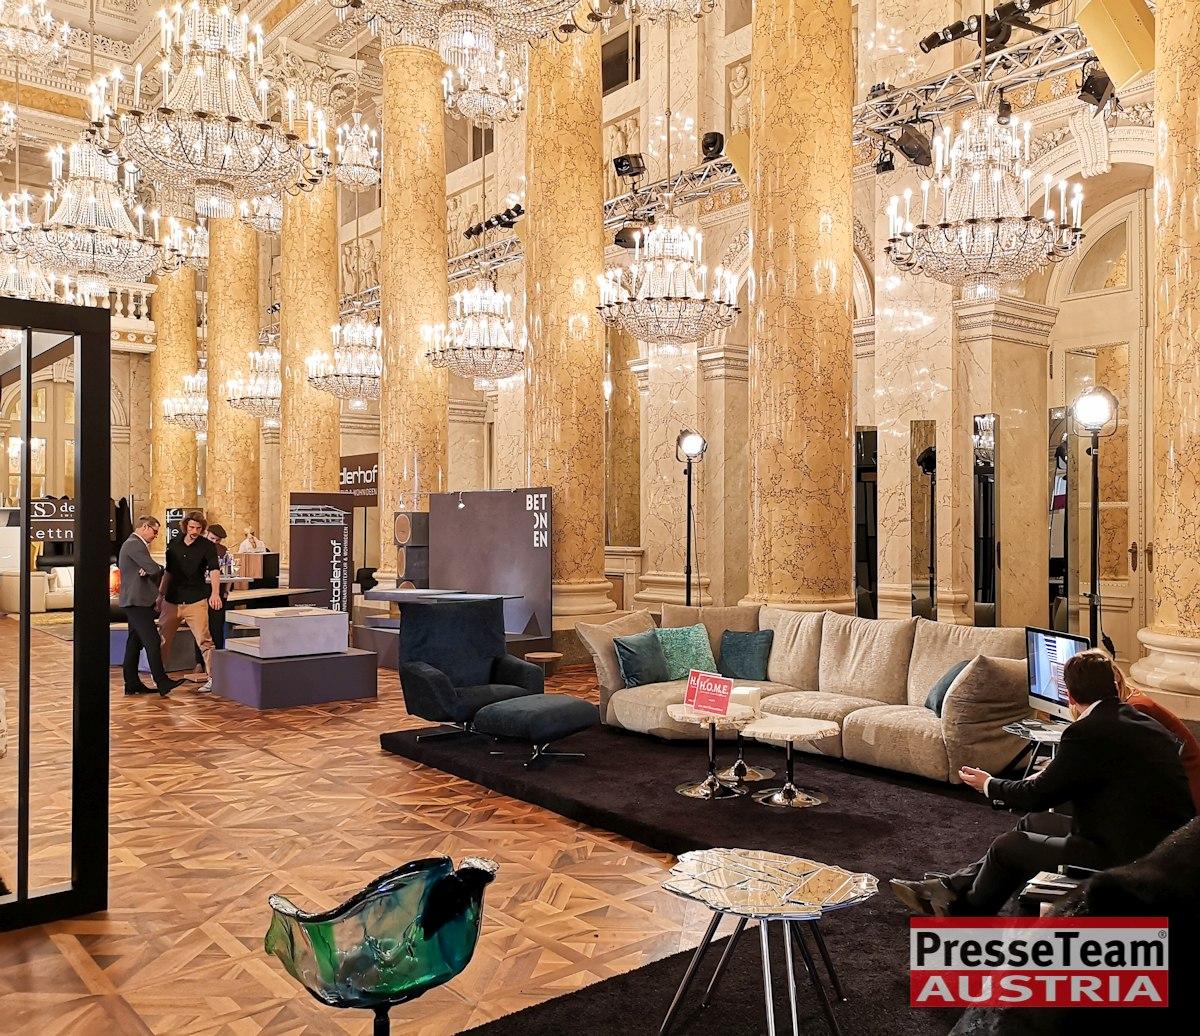 Messe Hofburg Wien 86 - Luxus Möbelmesse & Lifestyle in der Hofburg Wien